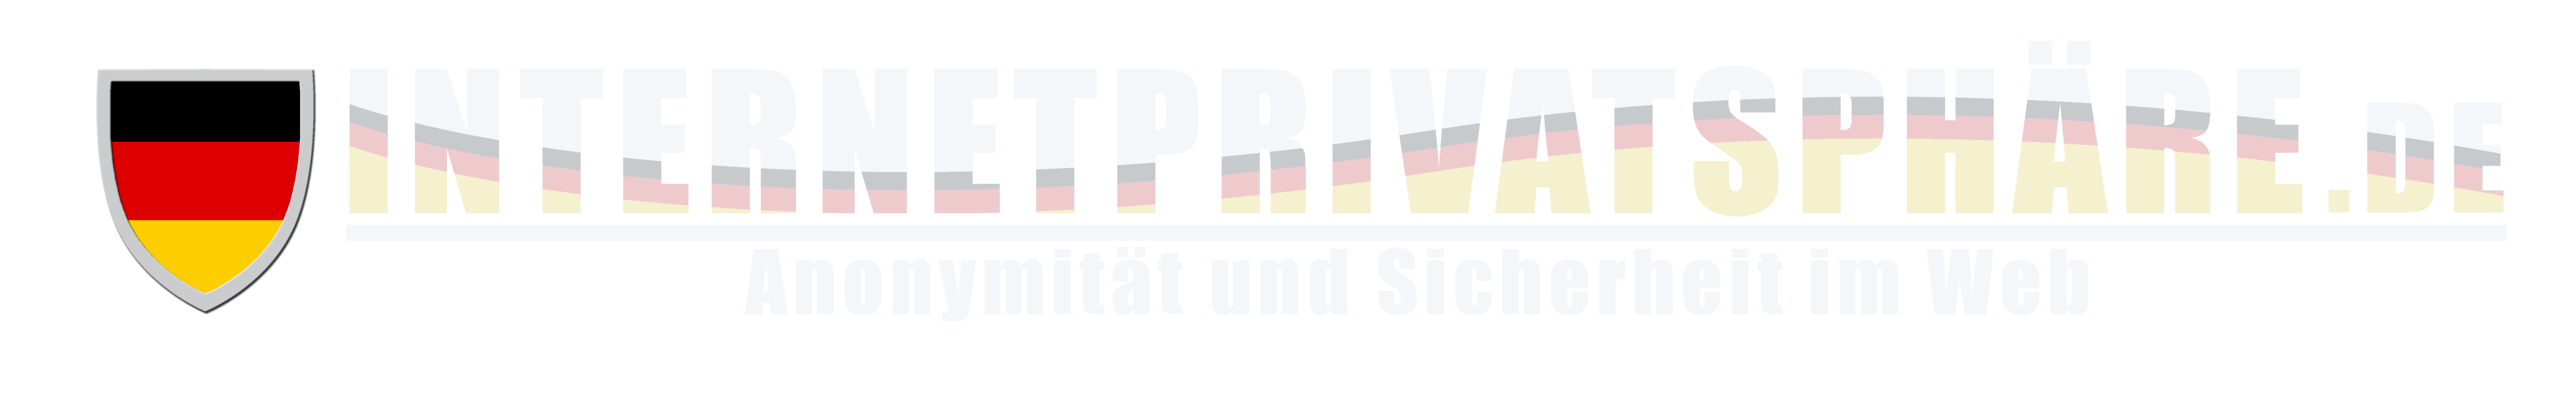 InternetPrivatsphare DE logo